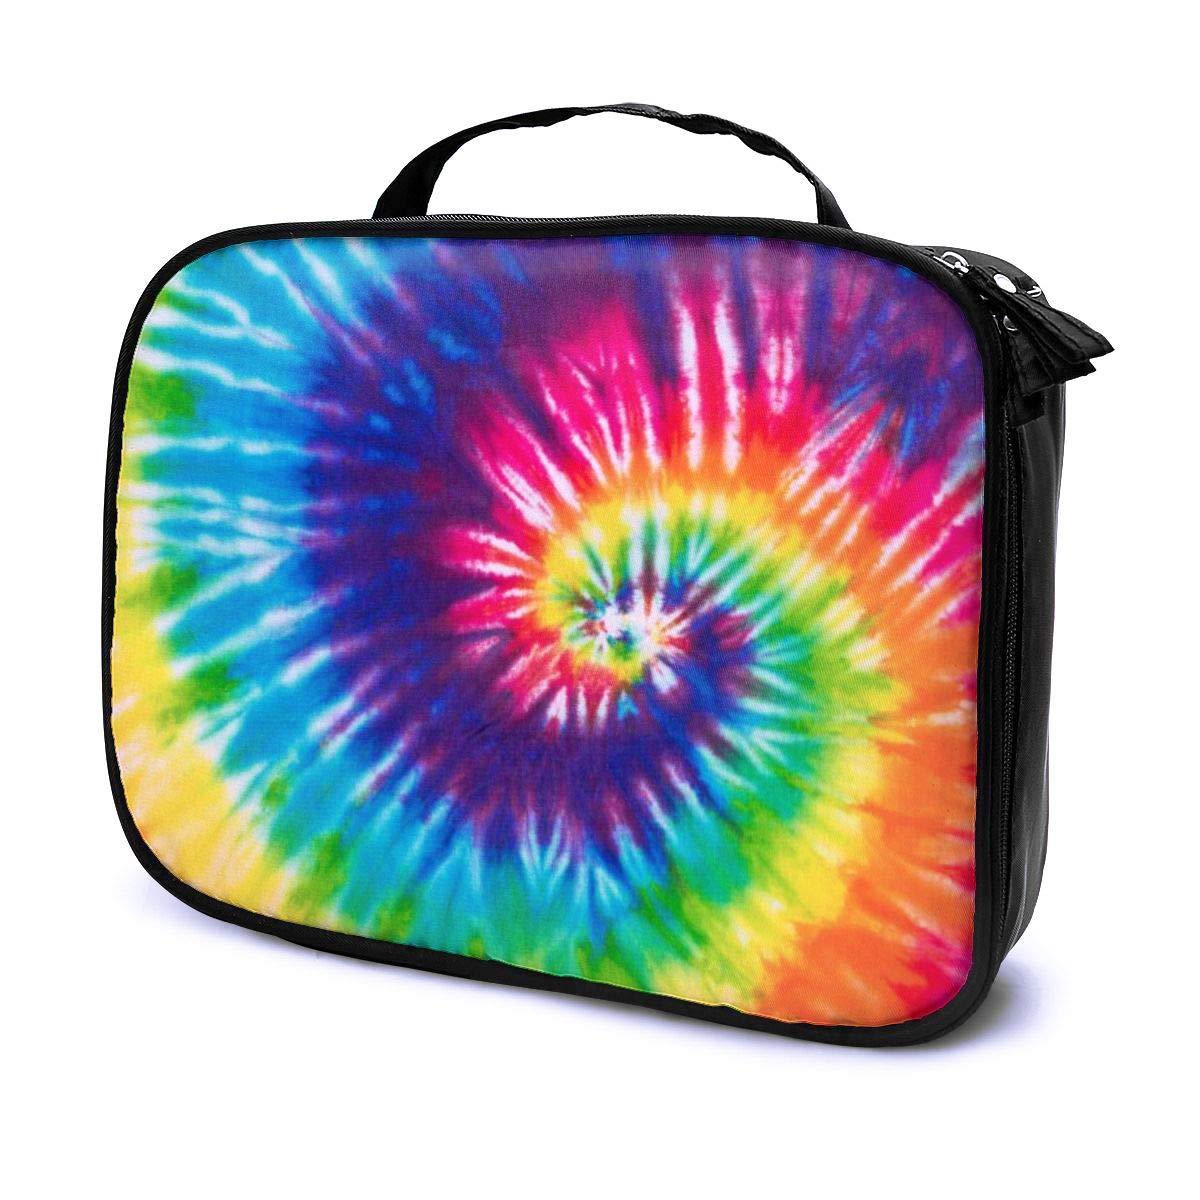 LOKIDVE Tie Dye Makeup Bag for Women Girls, Portable Travel Cosmetic Case Organizer, Removable Divider Toiletry Bag